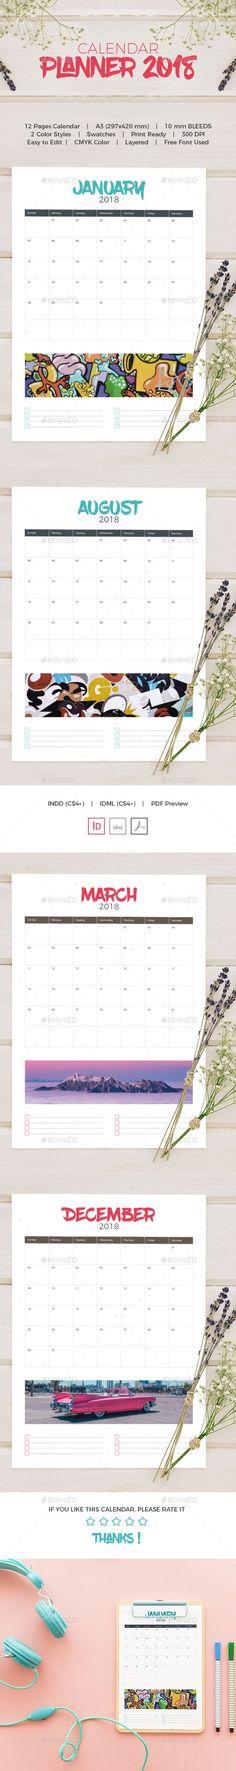 Wall Calendar 2018 Calendar 2018, Template and Walls - indesign calendar template